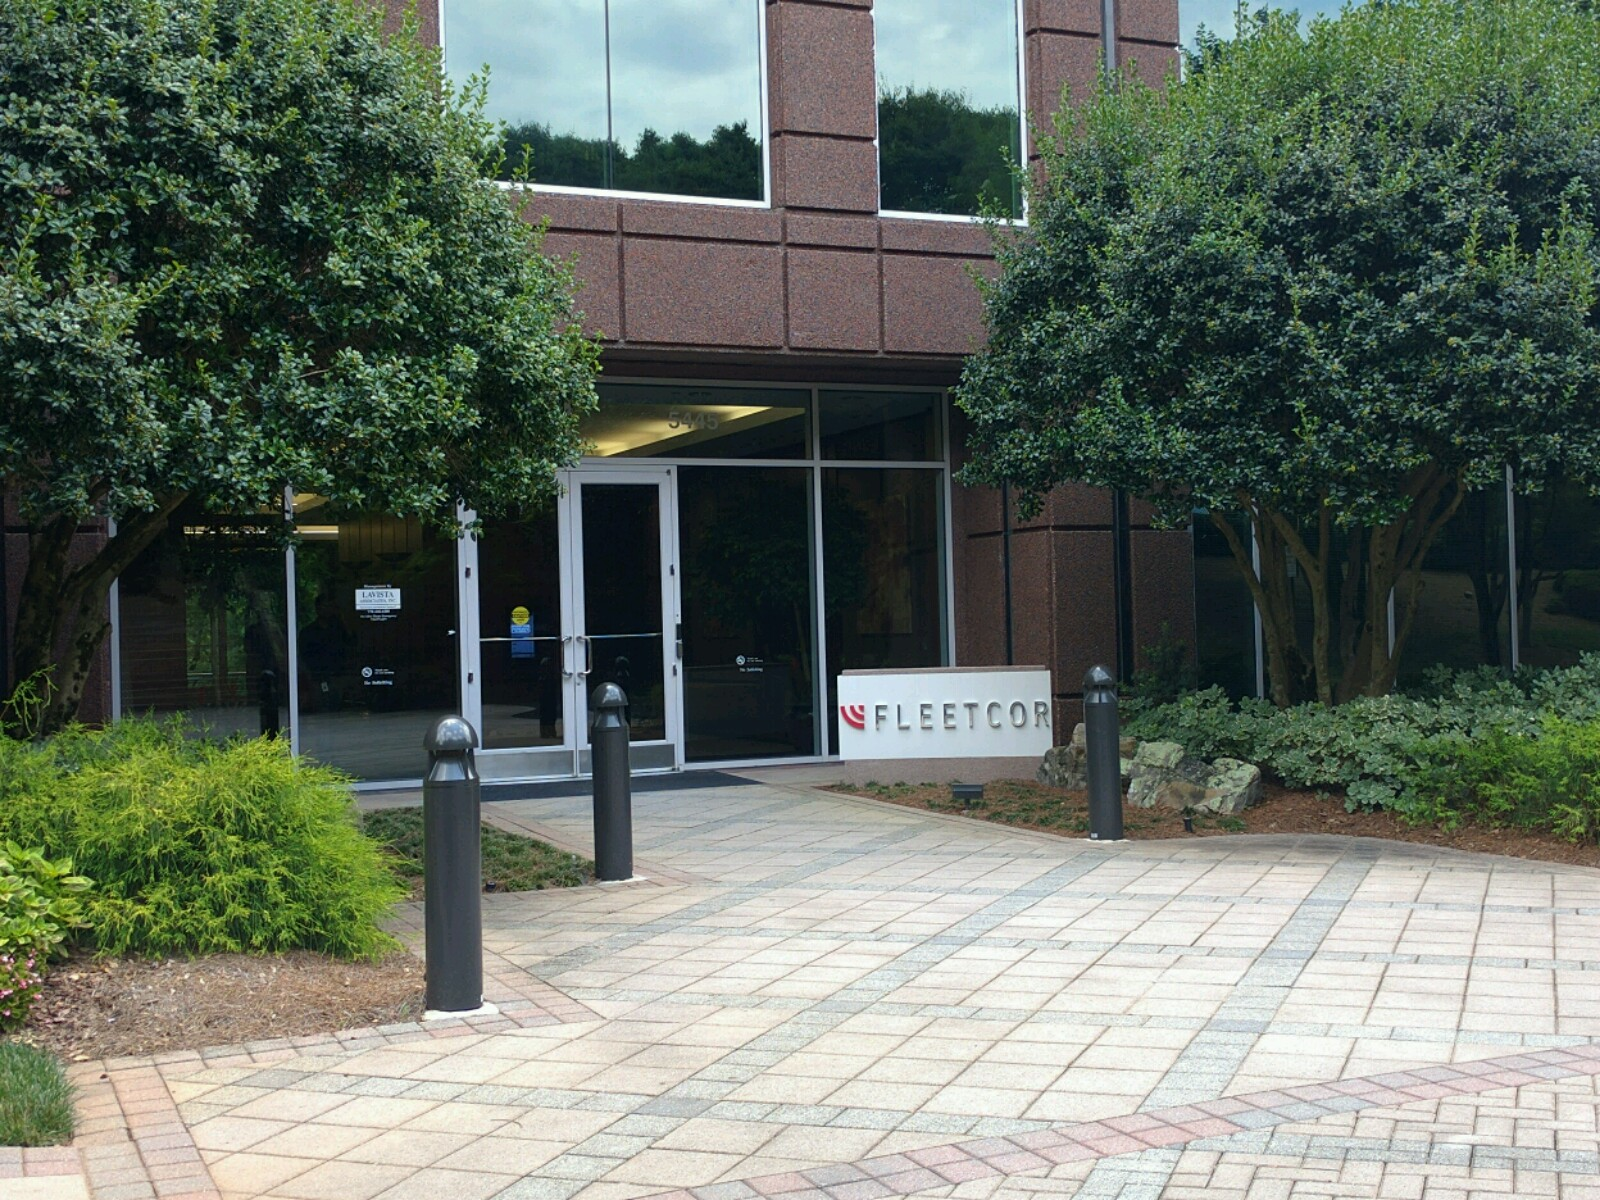 FleetCor's corporate headquarters in Norcross, Georgia.